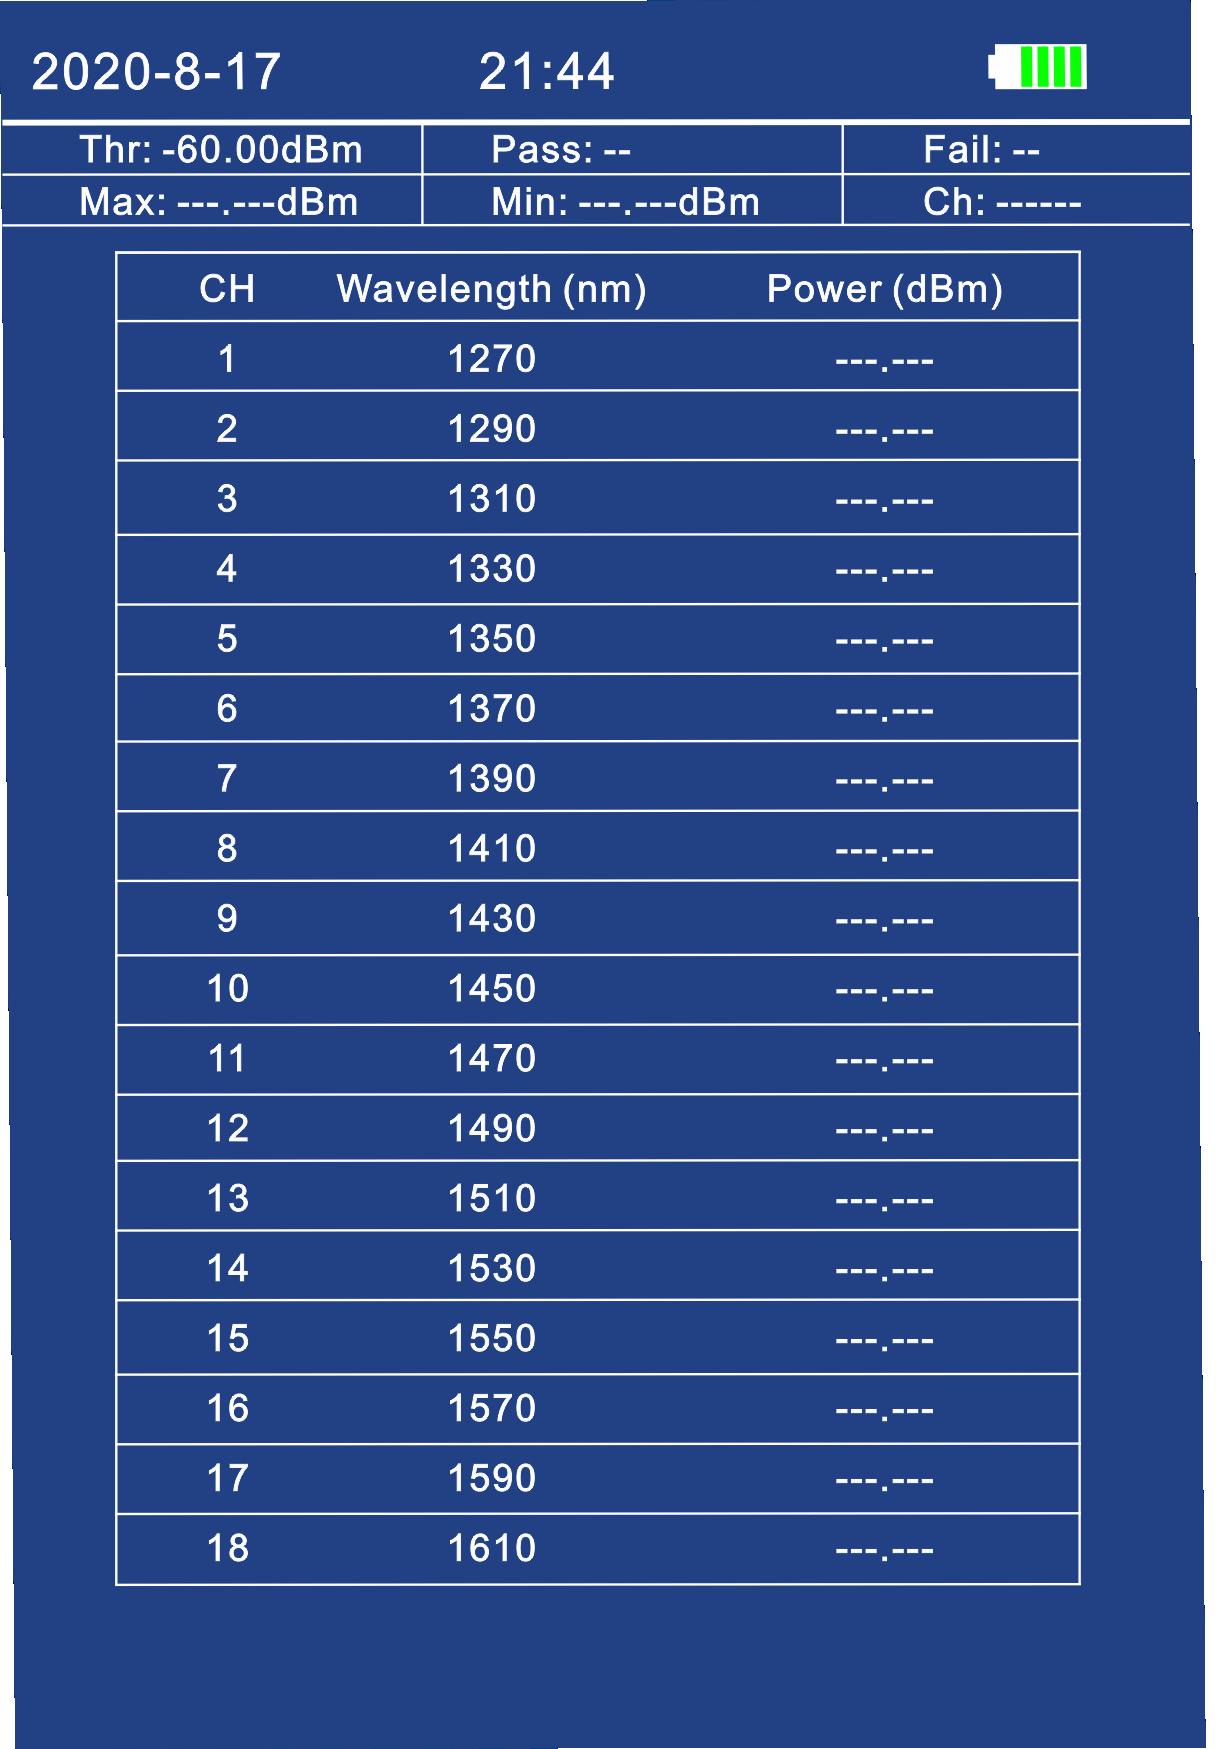 FF-3225 CWDM power meter